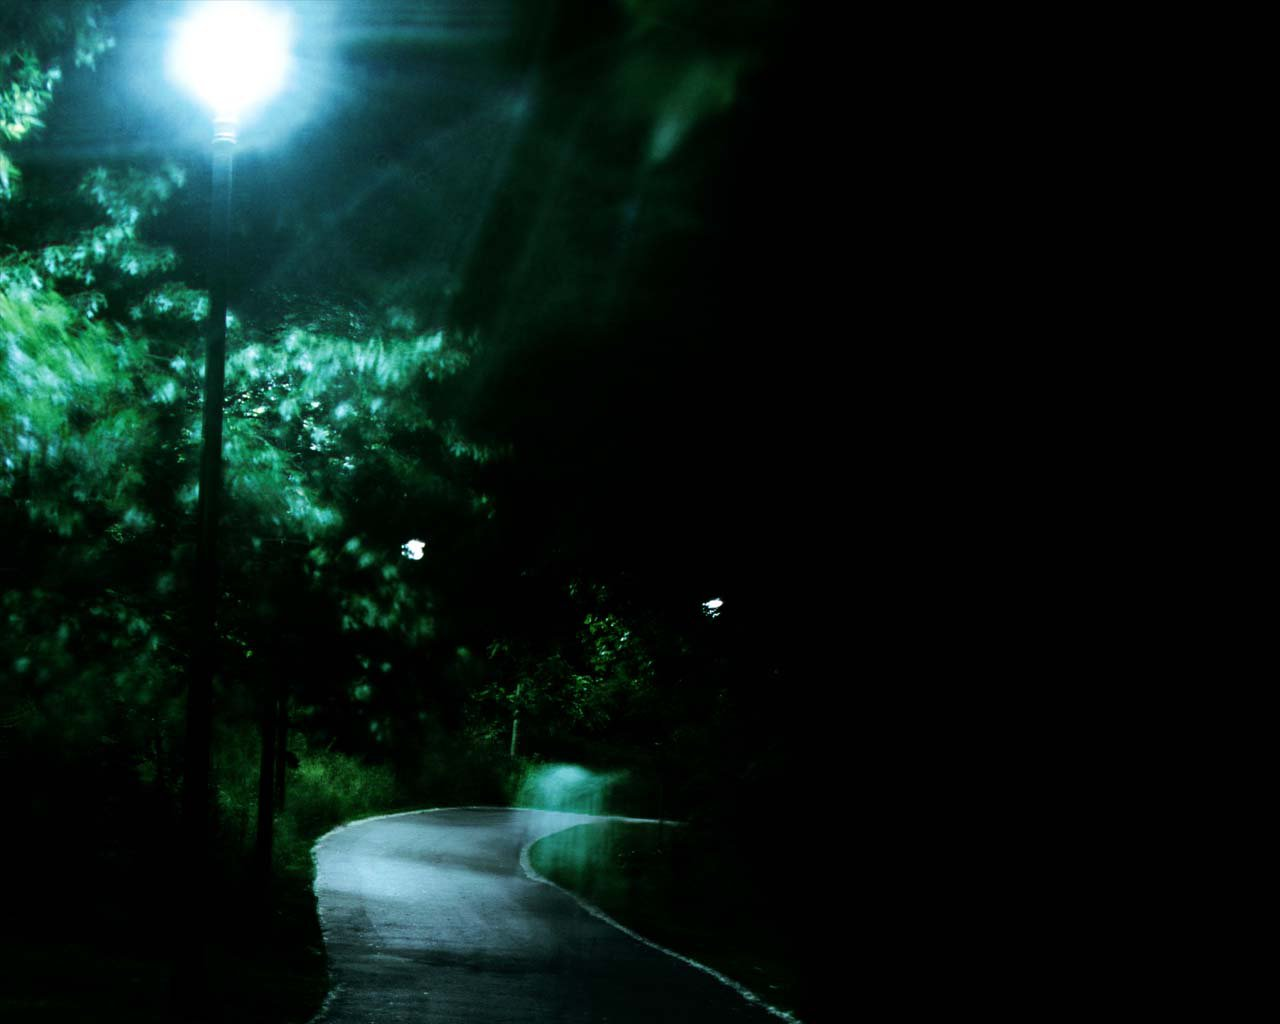 'Night Path' - Background